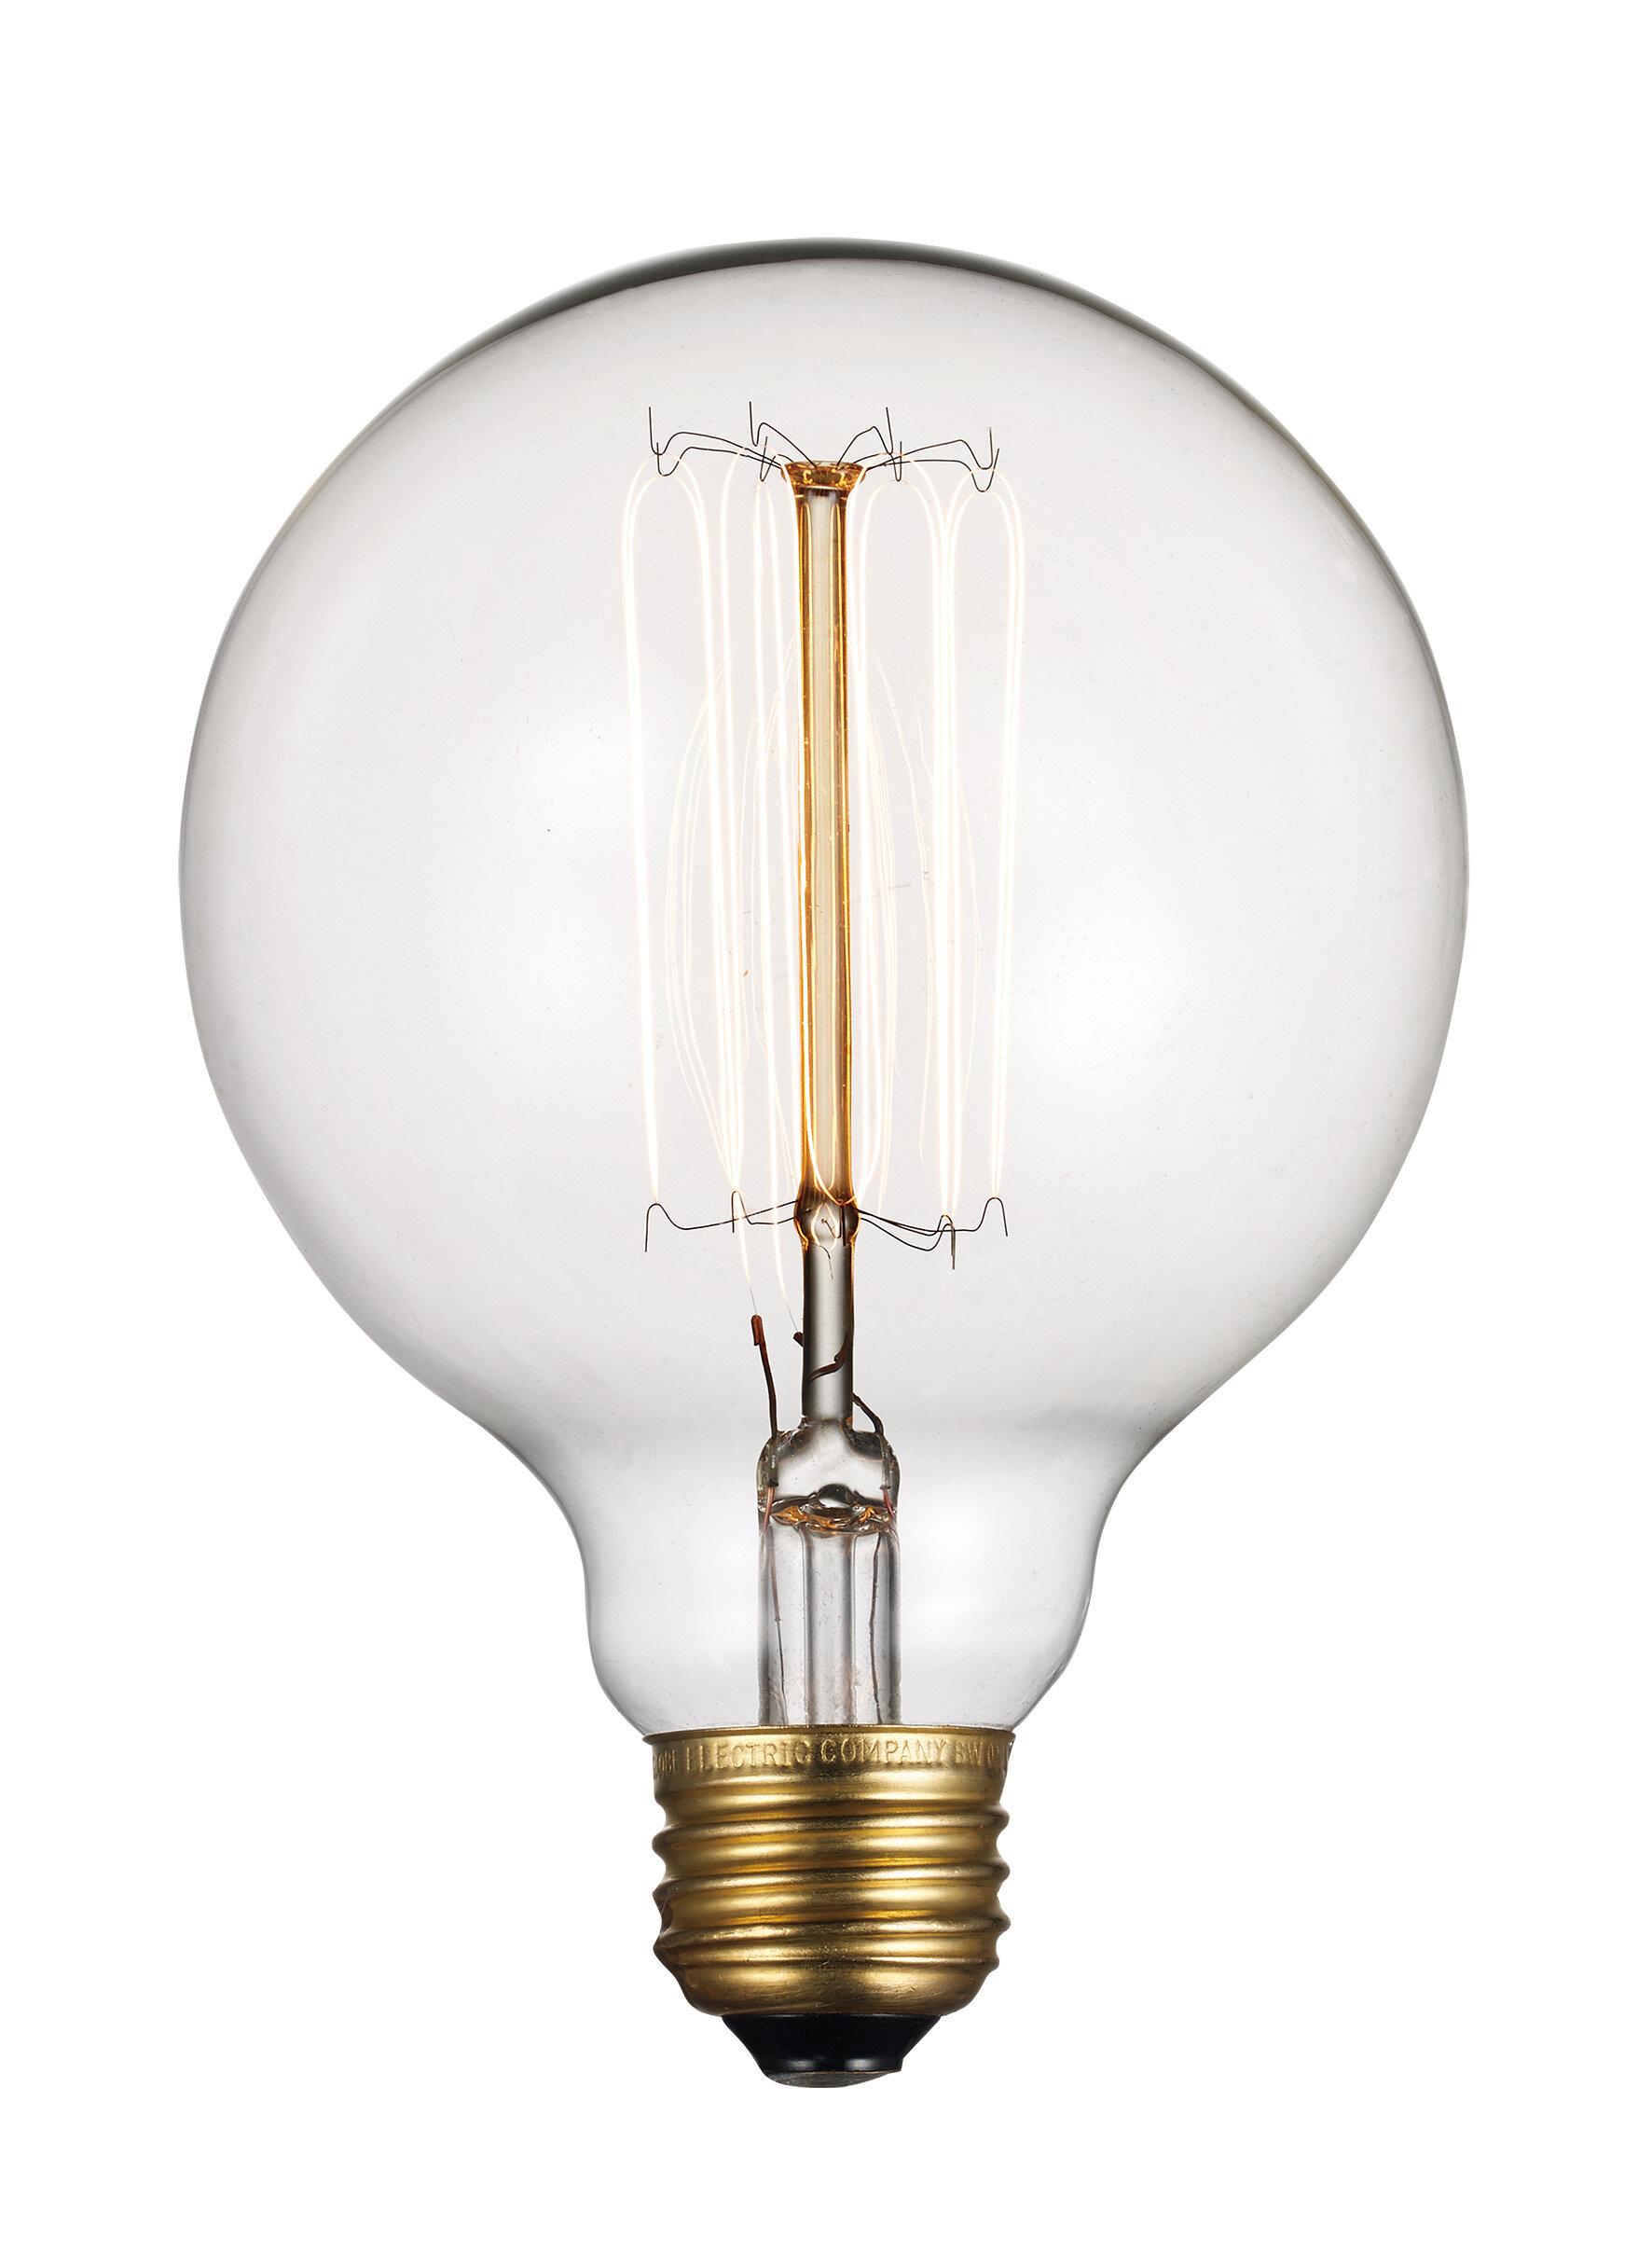 60 Watt Incandescent Light Bulb